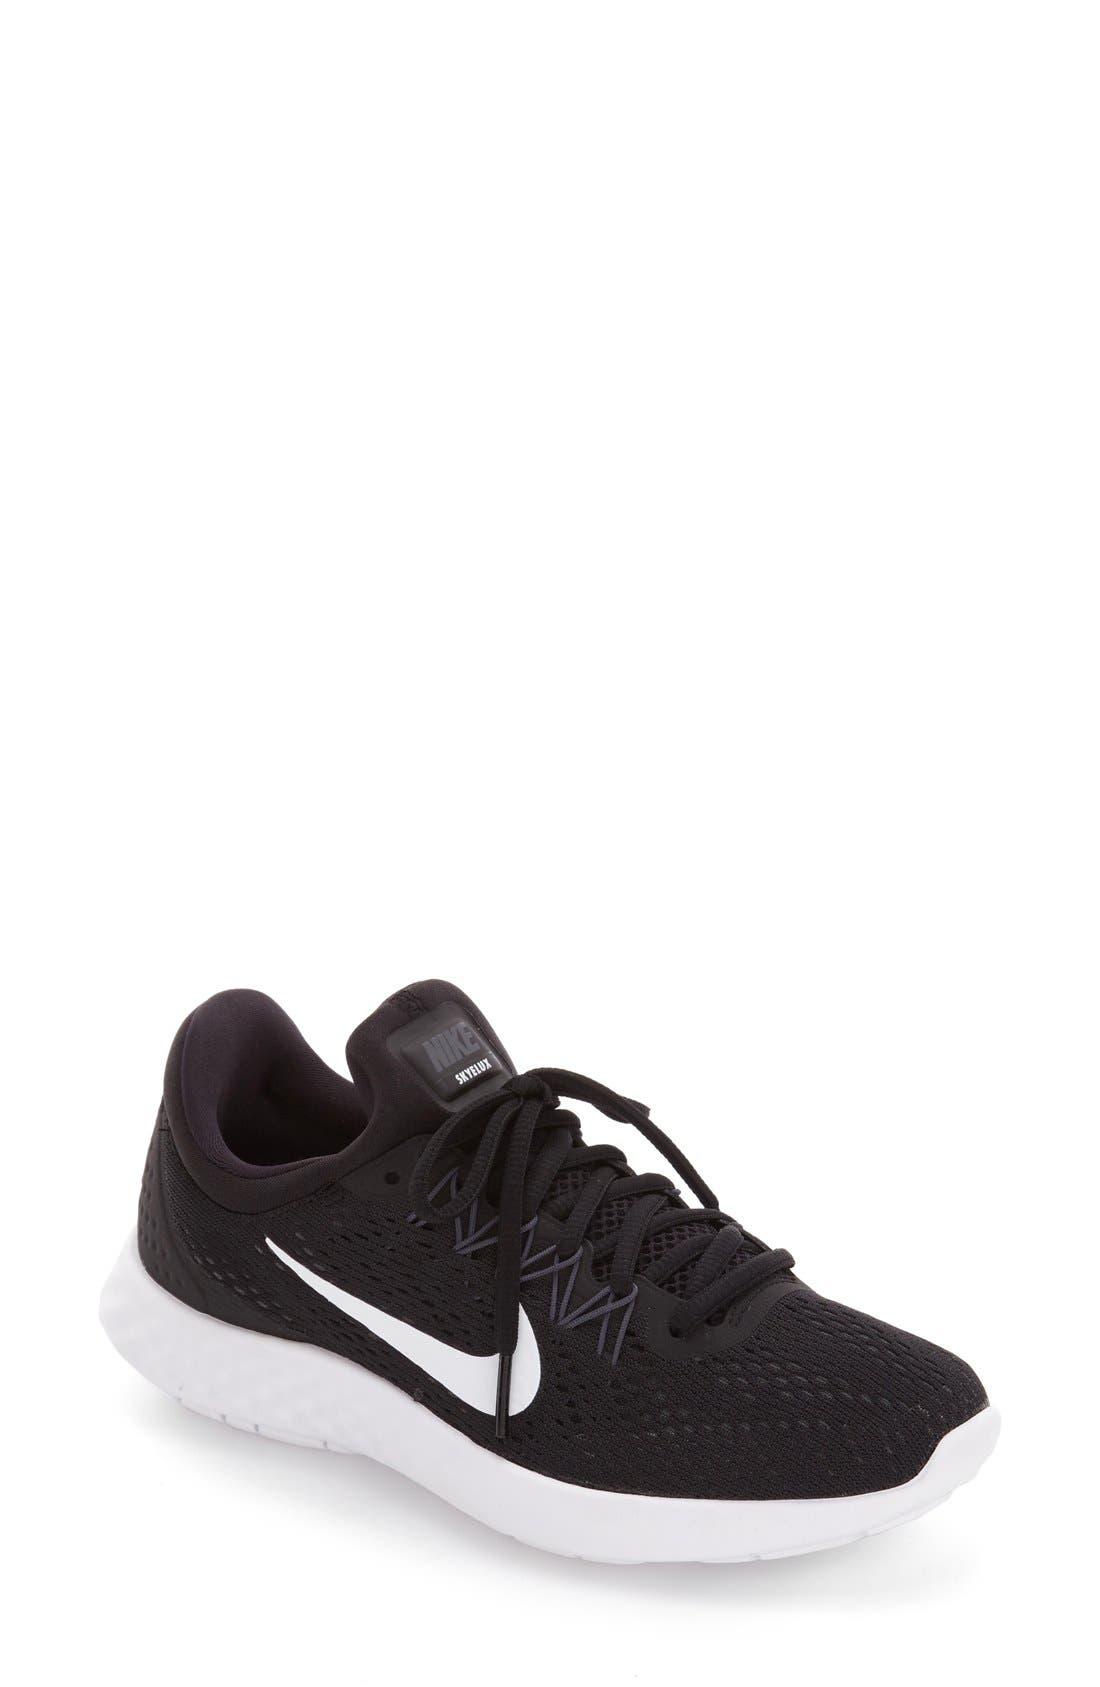 Lunar Skyelux Running Shoe, Main, color, 001